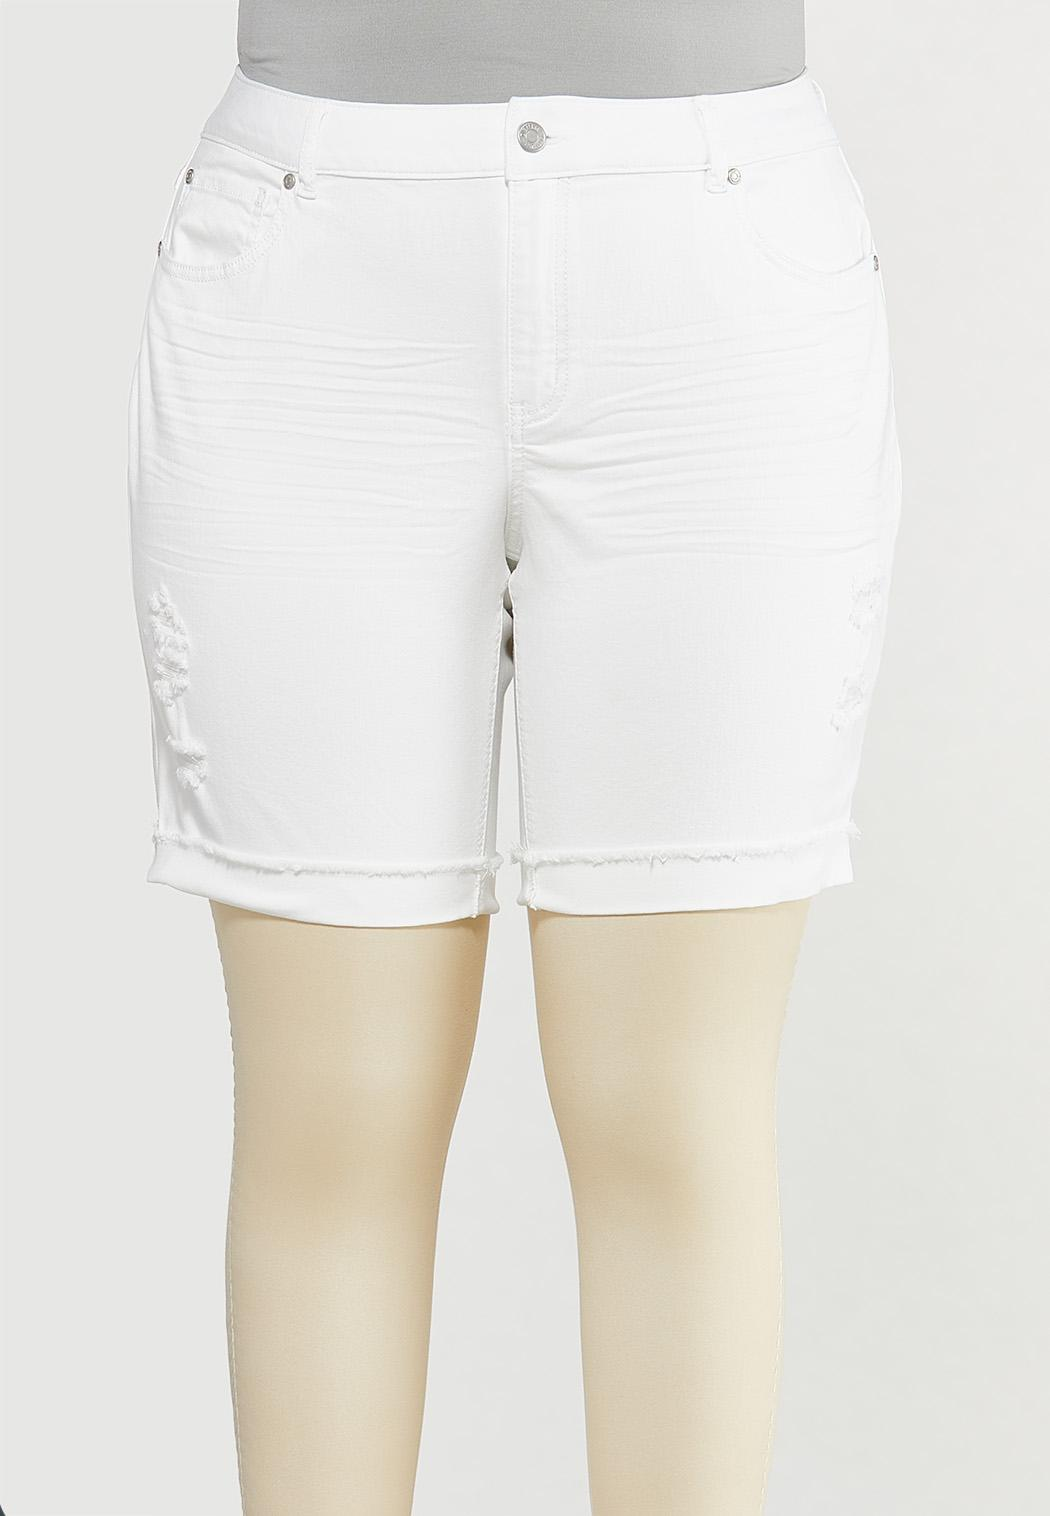 Plus Size White Distressed Denim Shorts